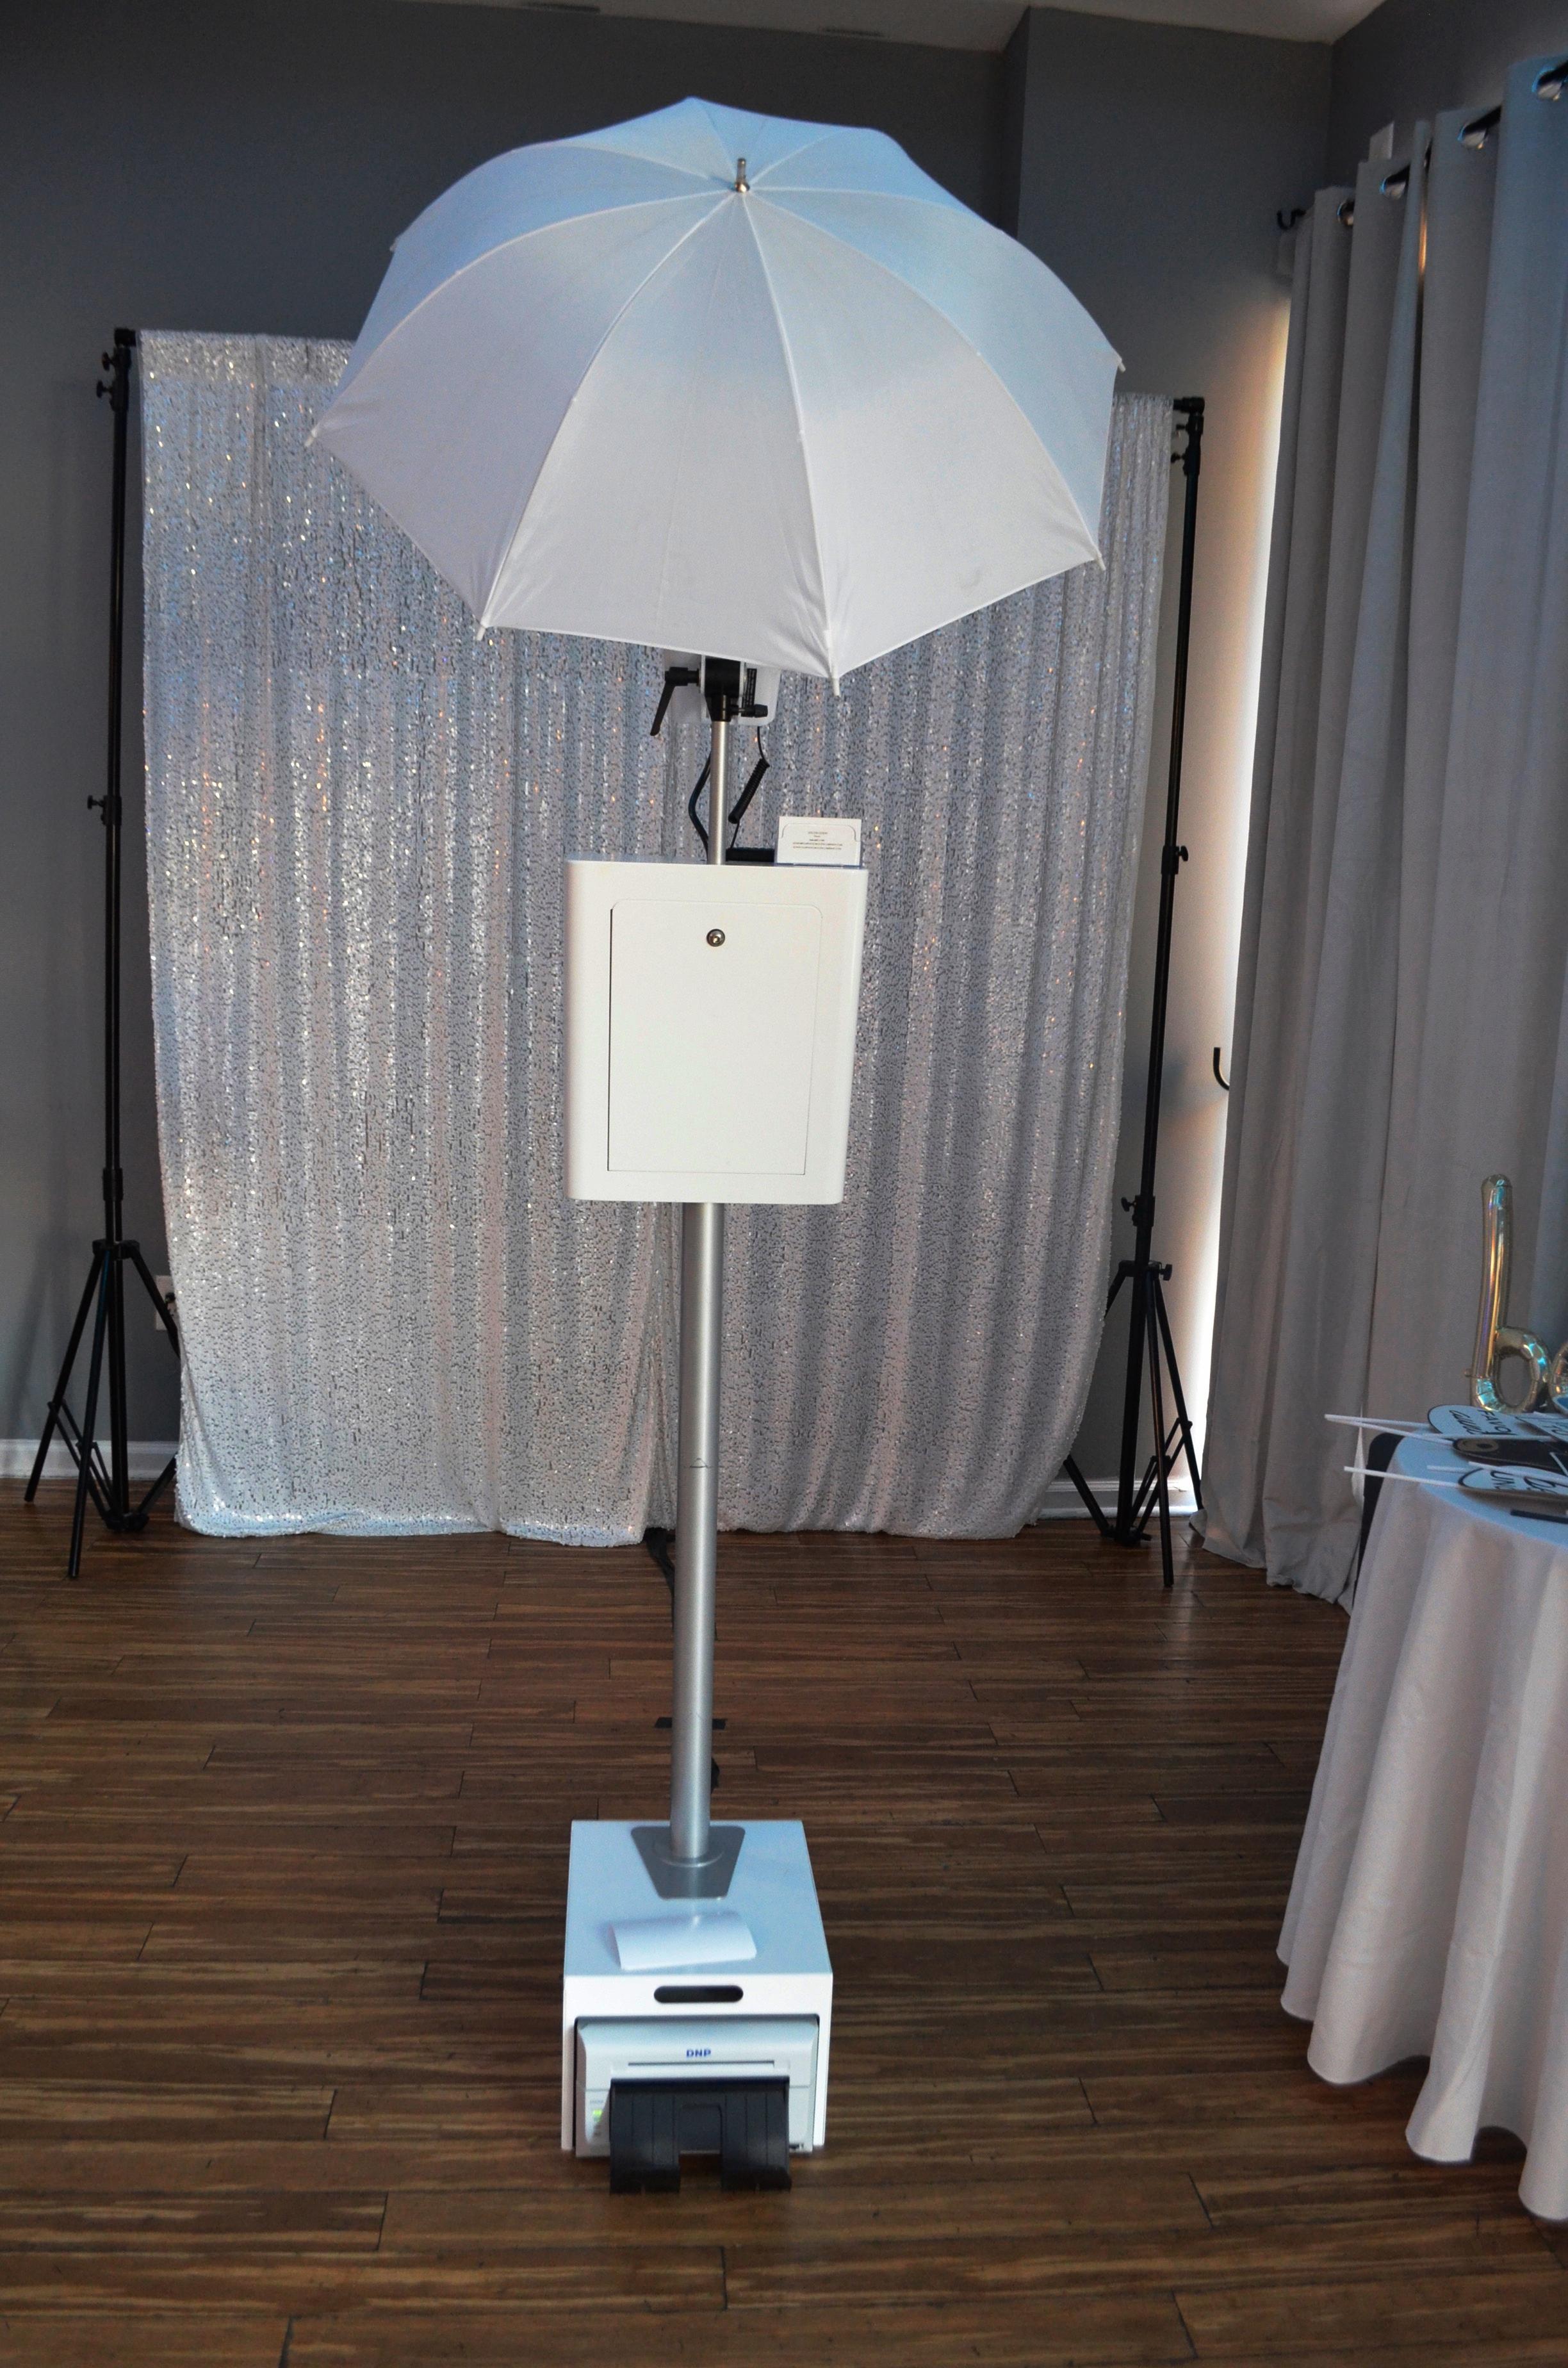 NYc photobooth rental